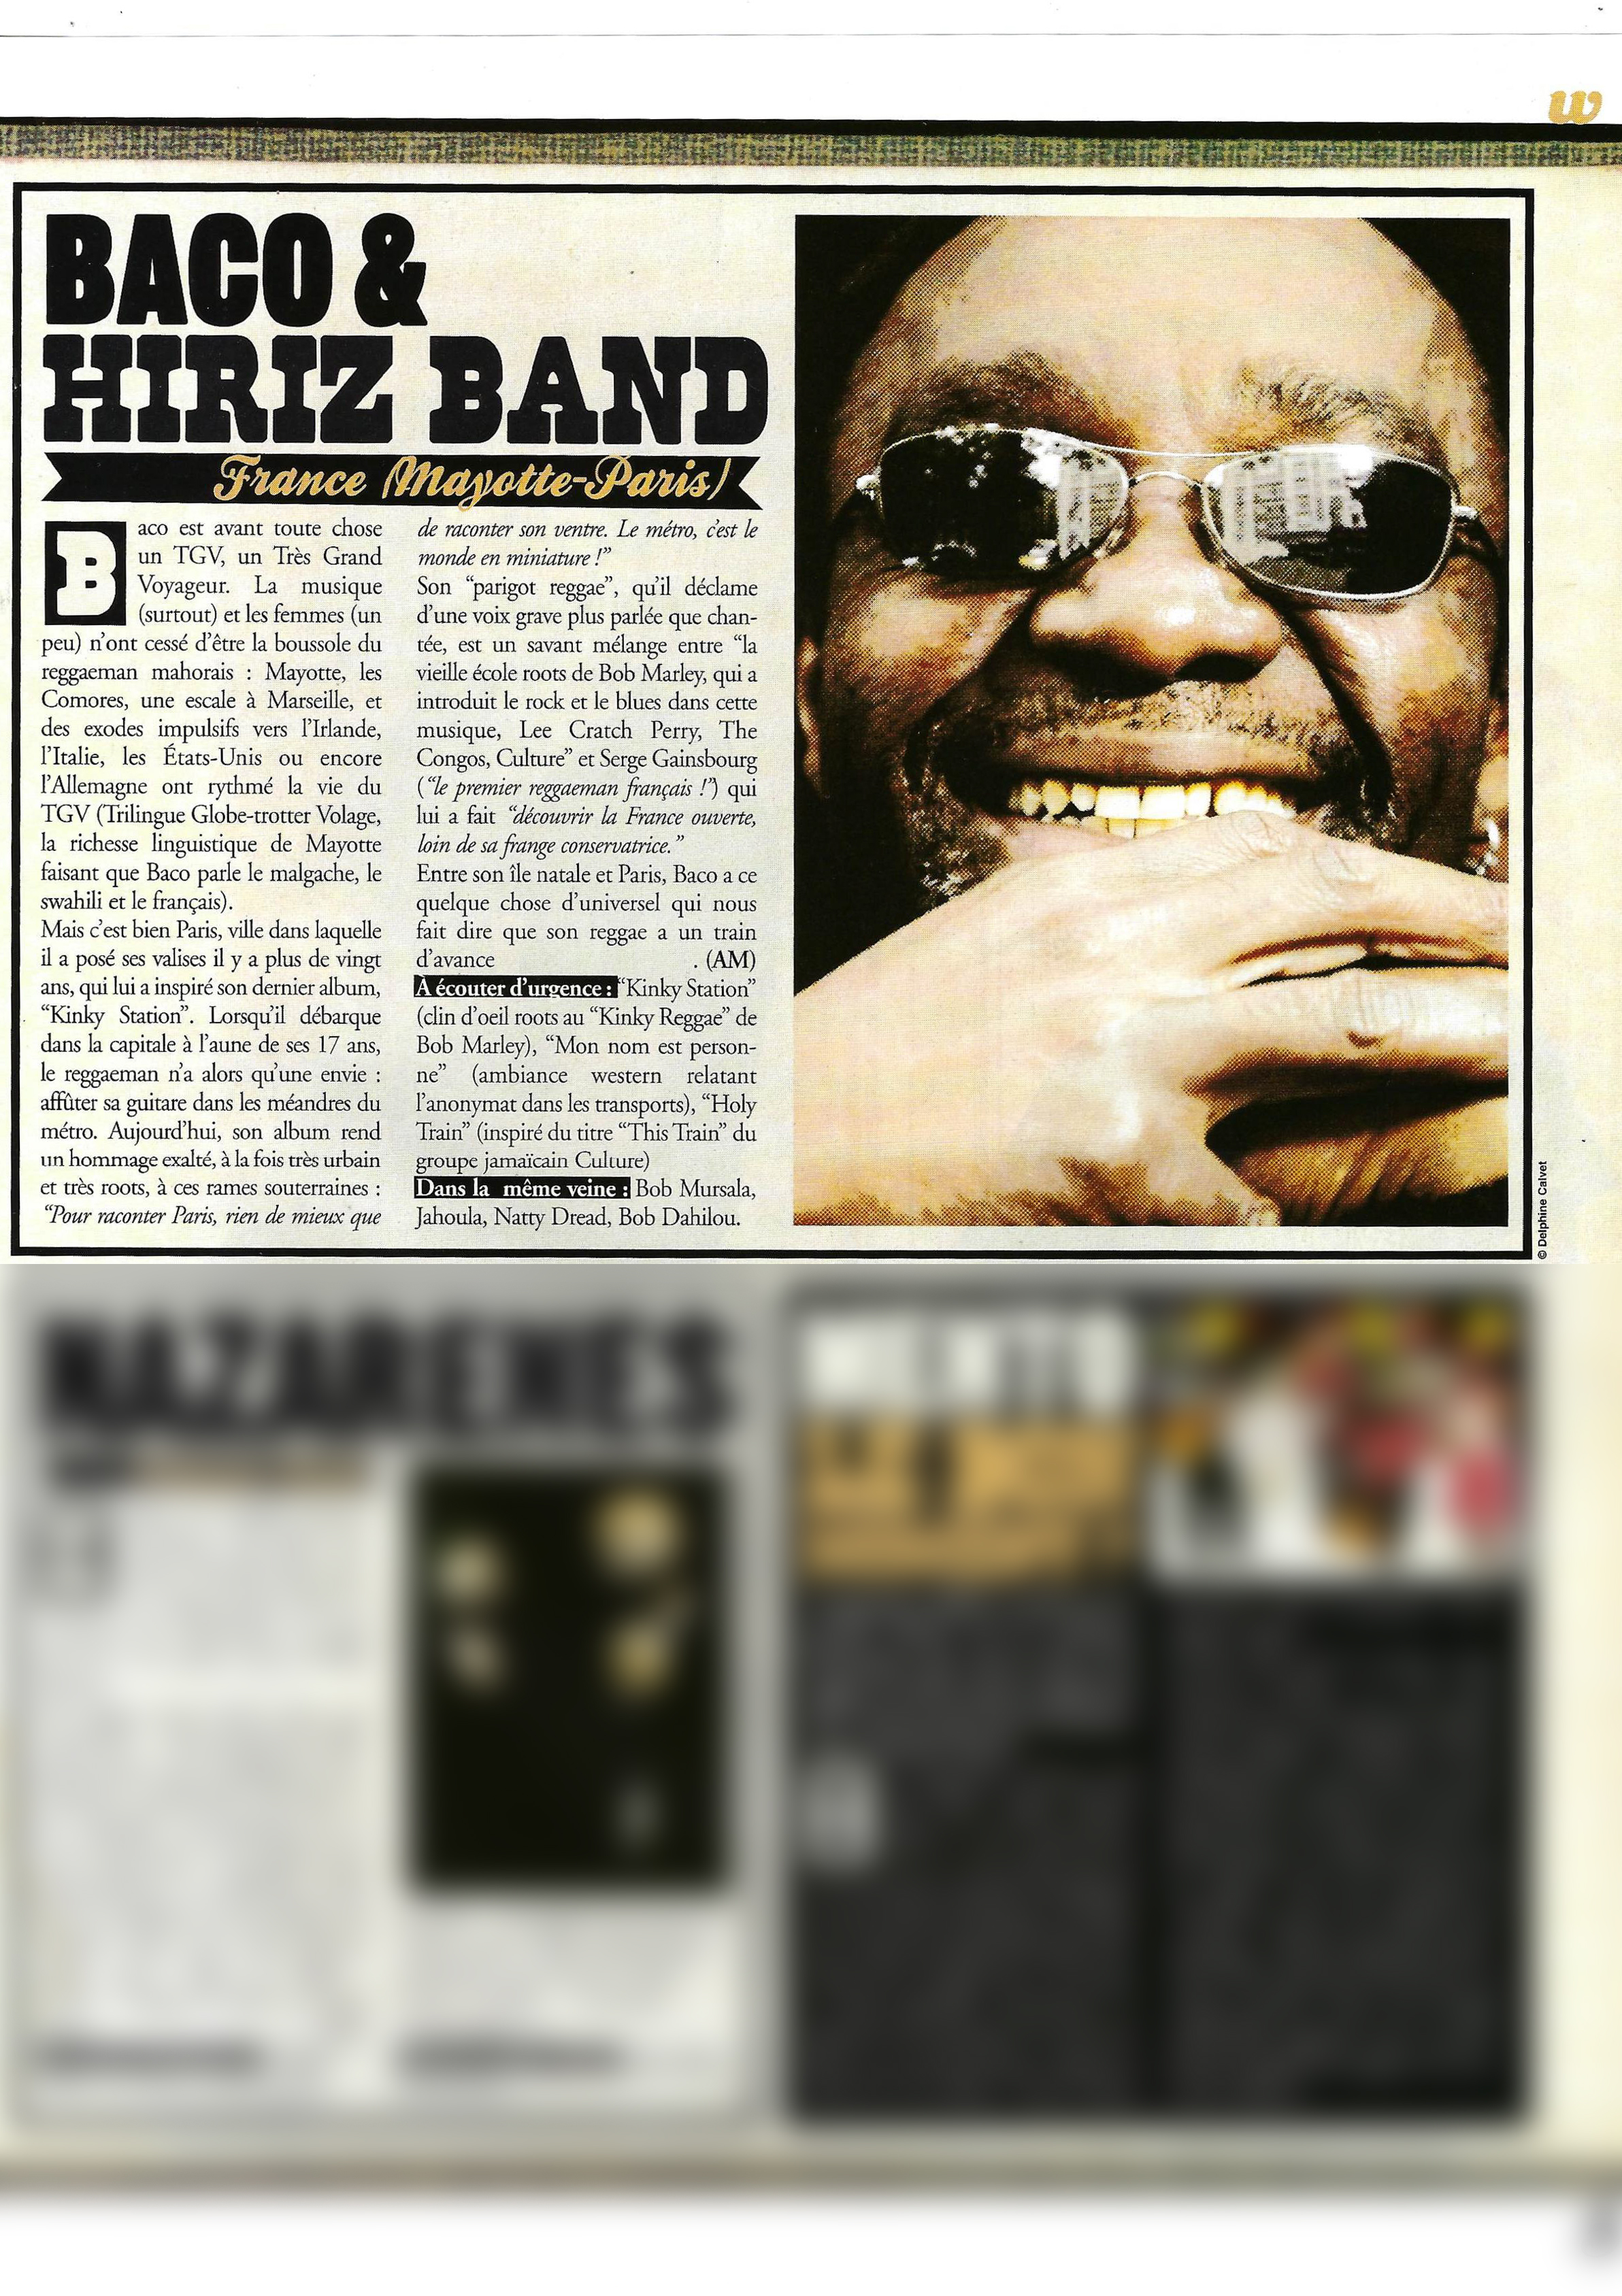 Baco & Hiriz Band (World Sound)